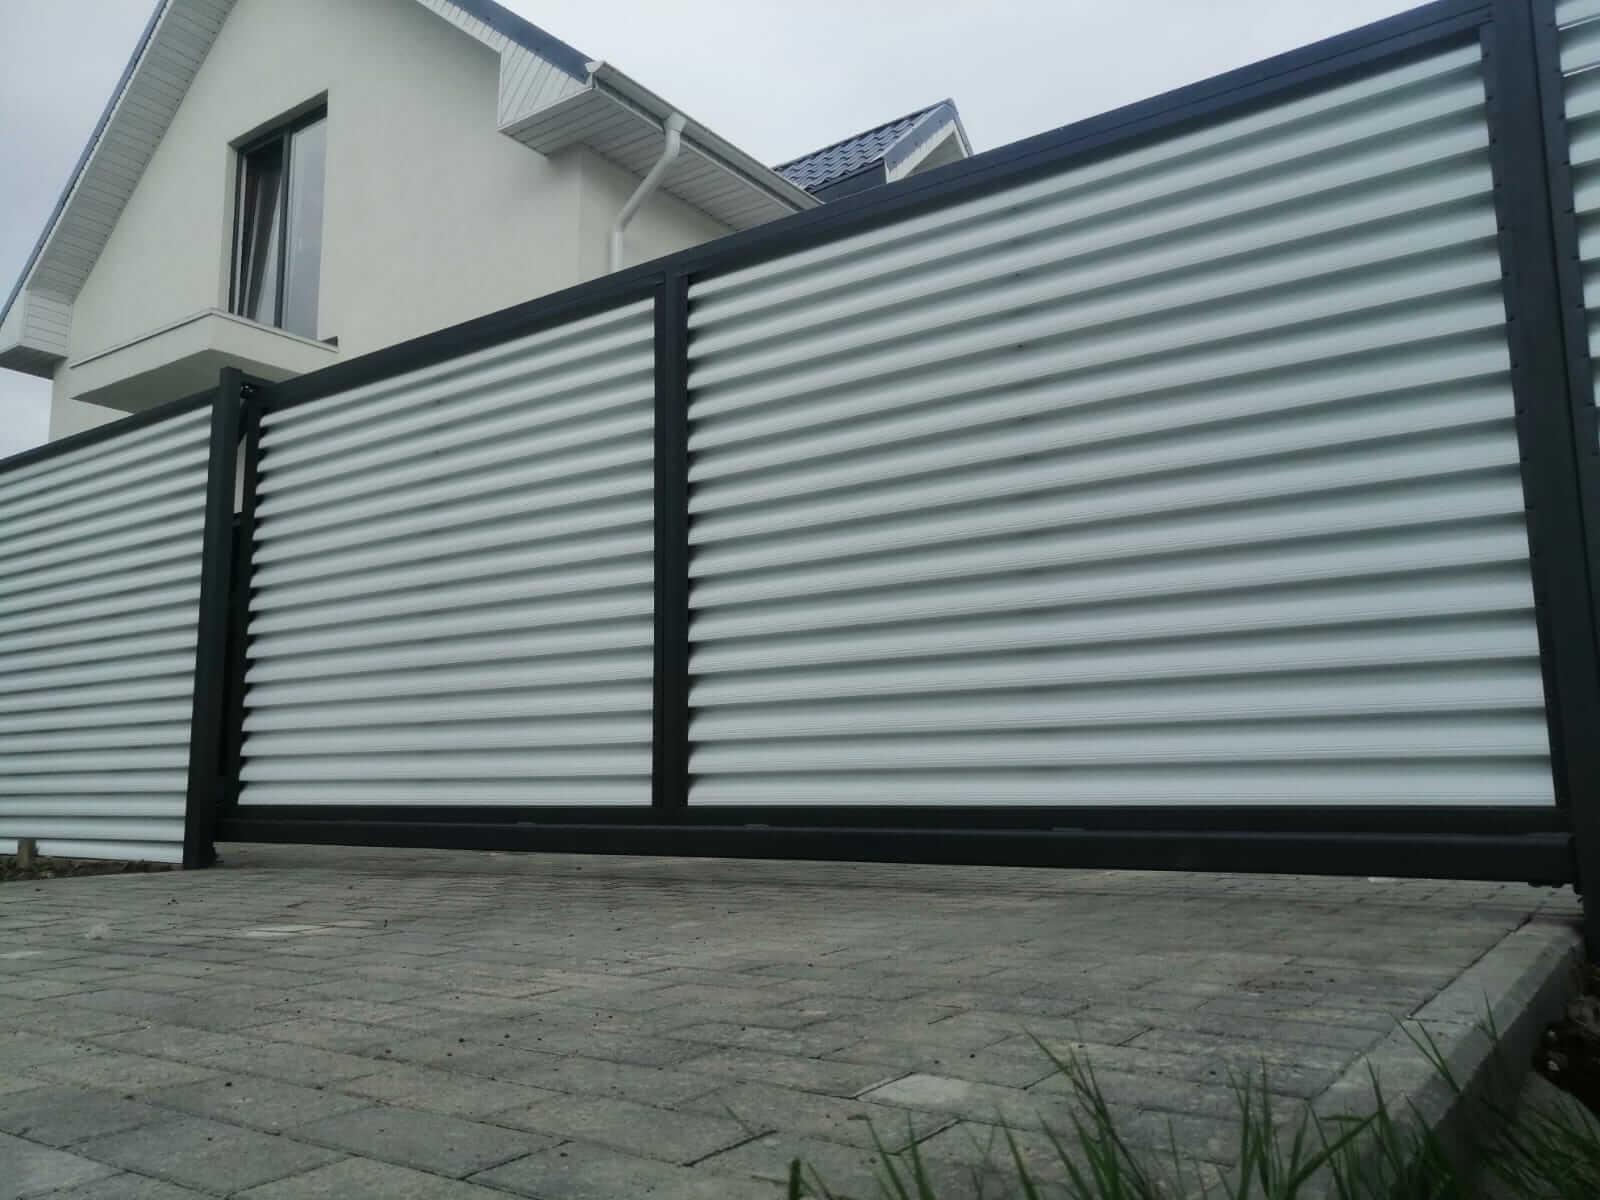 забор-жалюзи белый двухсторонний фото4